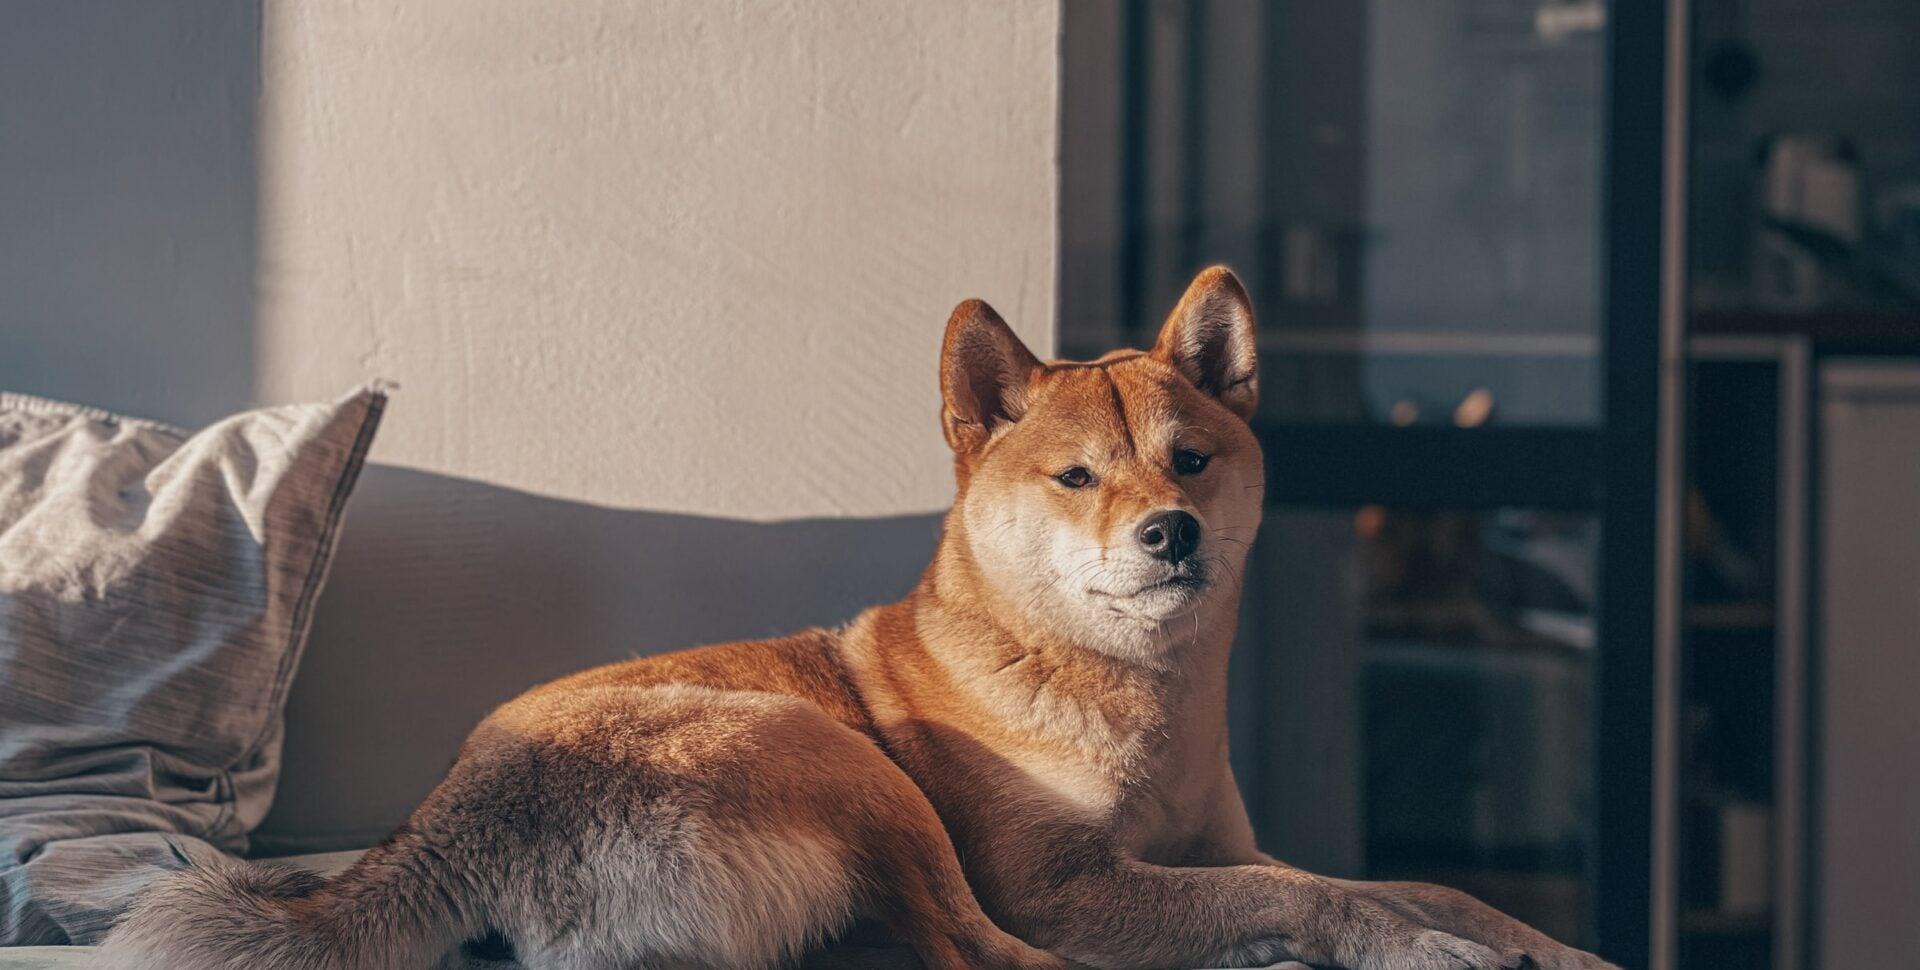 criptomoneda perro elon musk